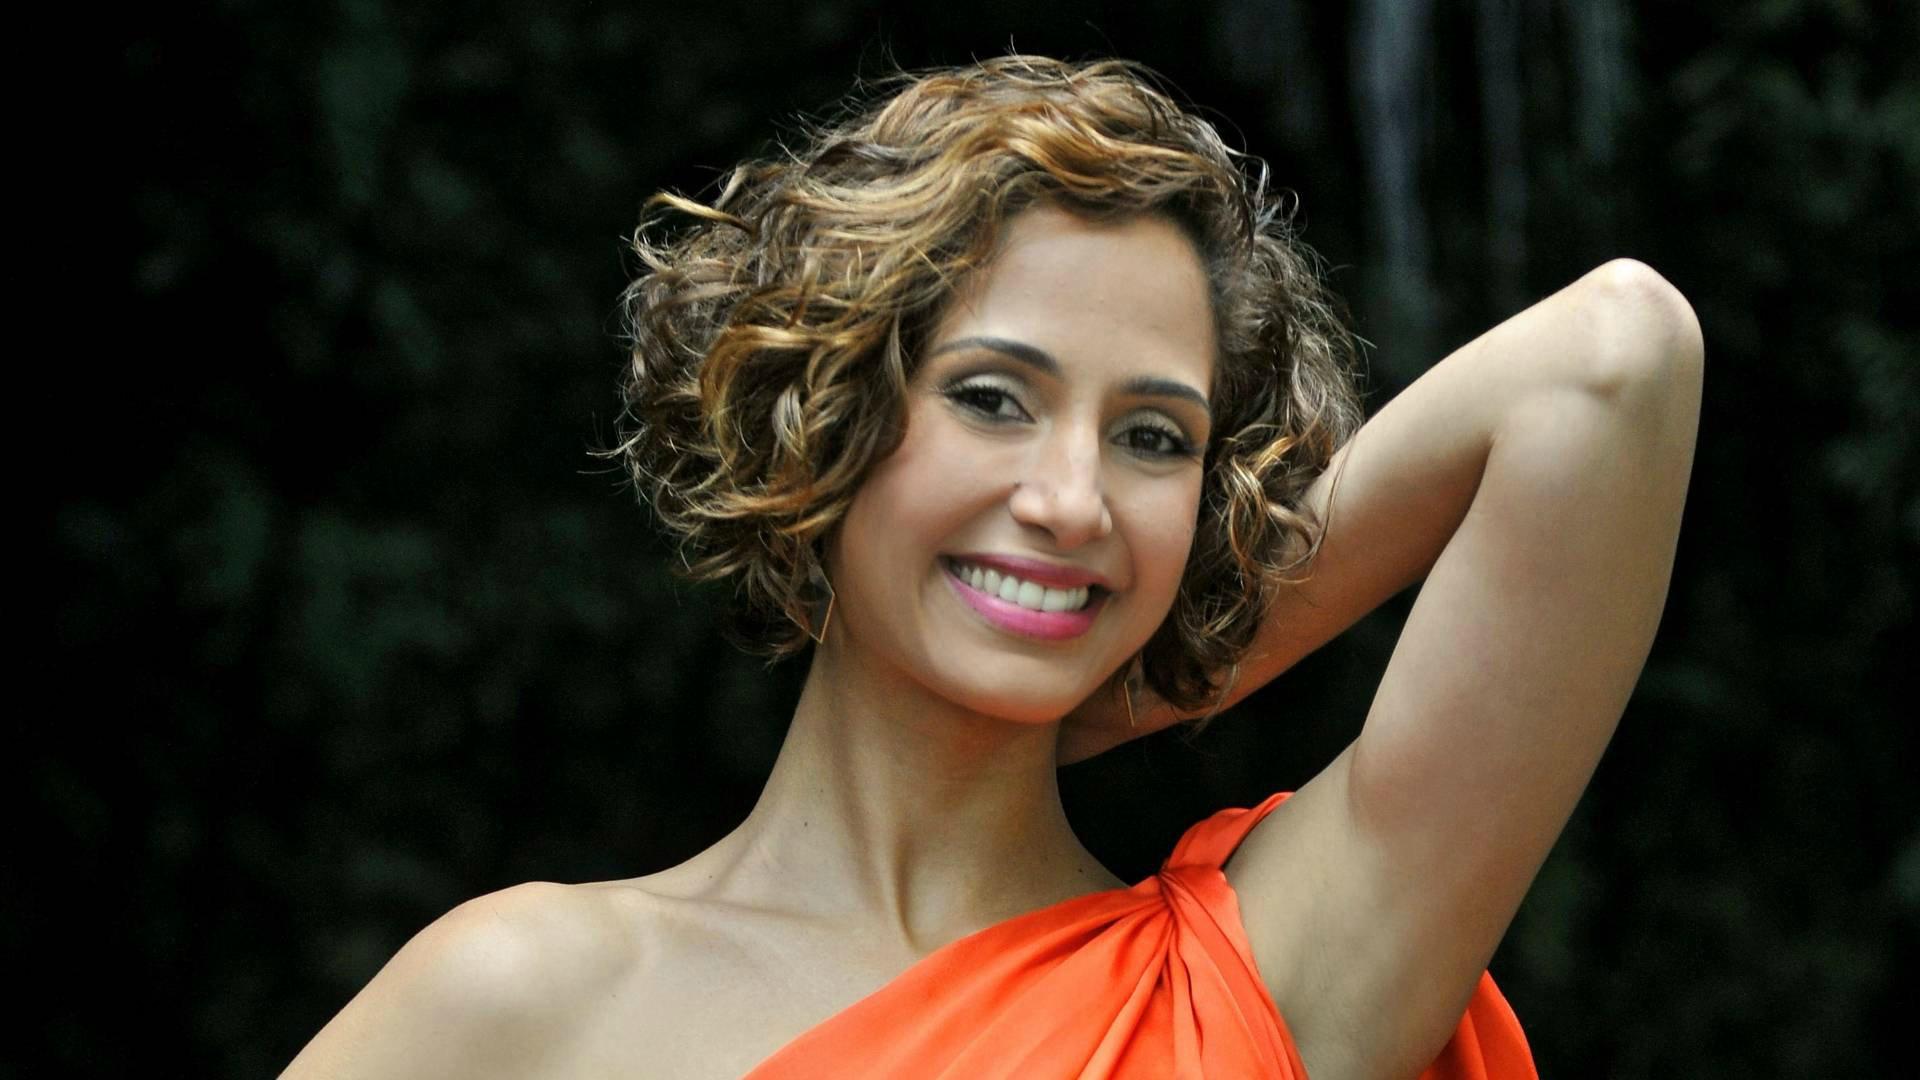 Fotos De Camila Pitanga Nua camila pitanga photo gallery - page #3 | celebs-place